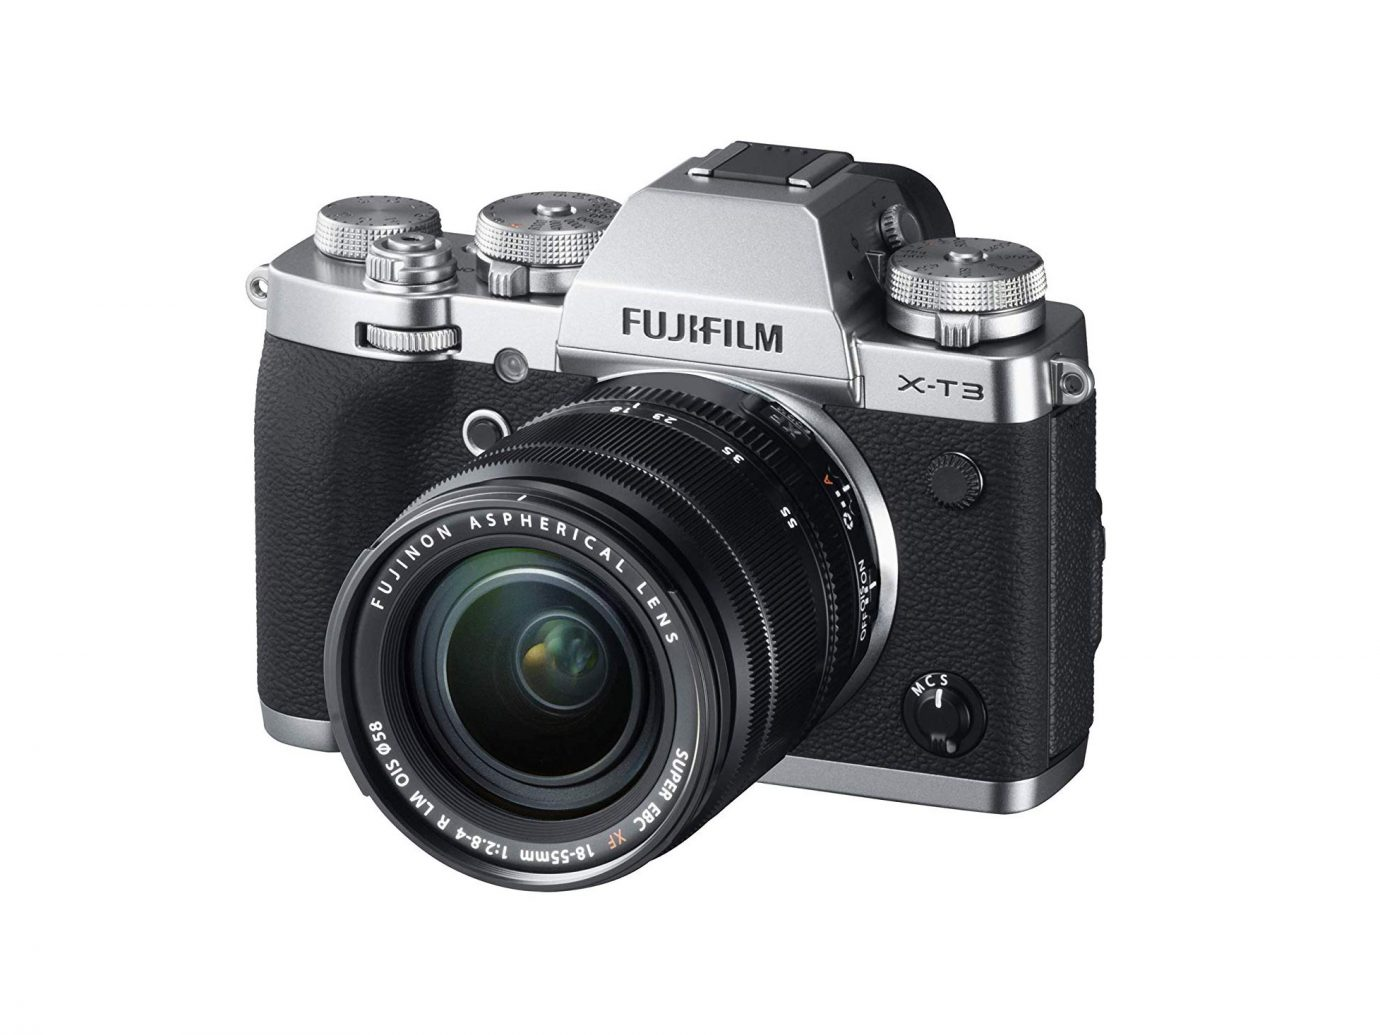 Fujifilm X-T3 Mirrorless Digital Camera on Amazon